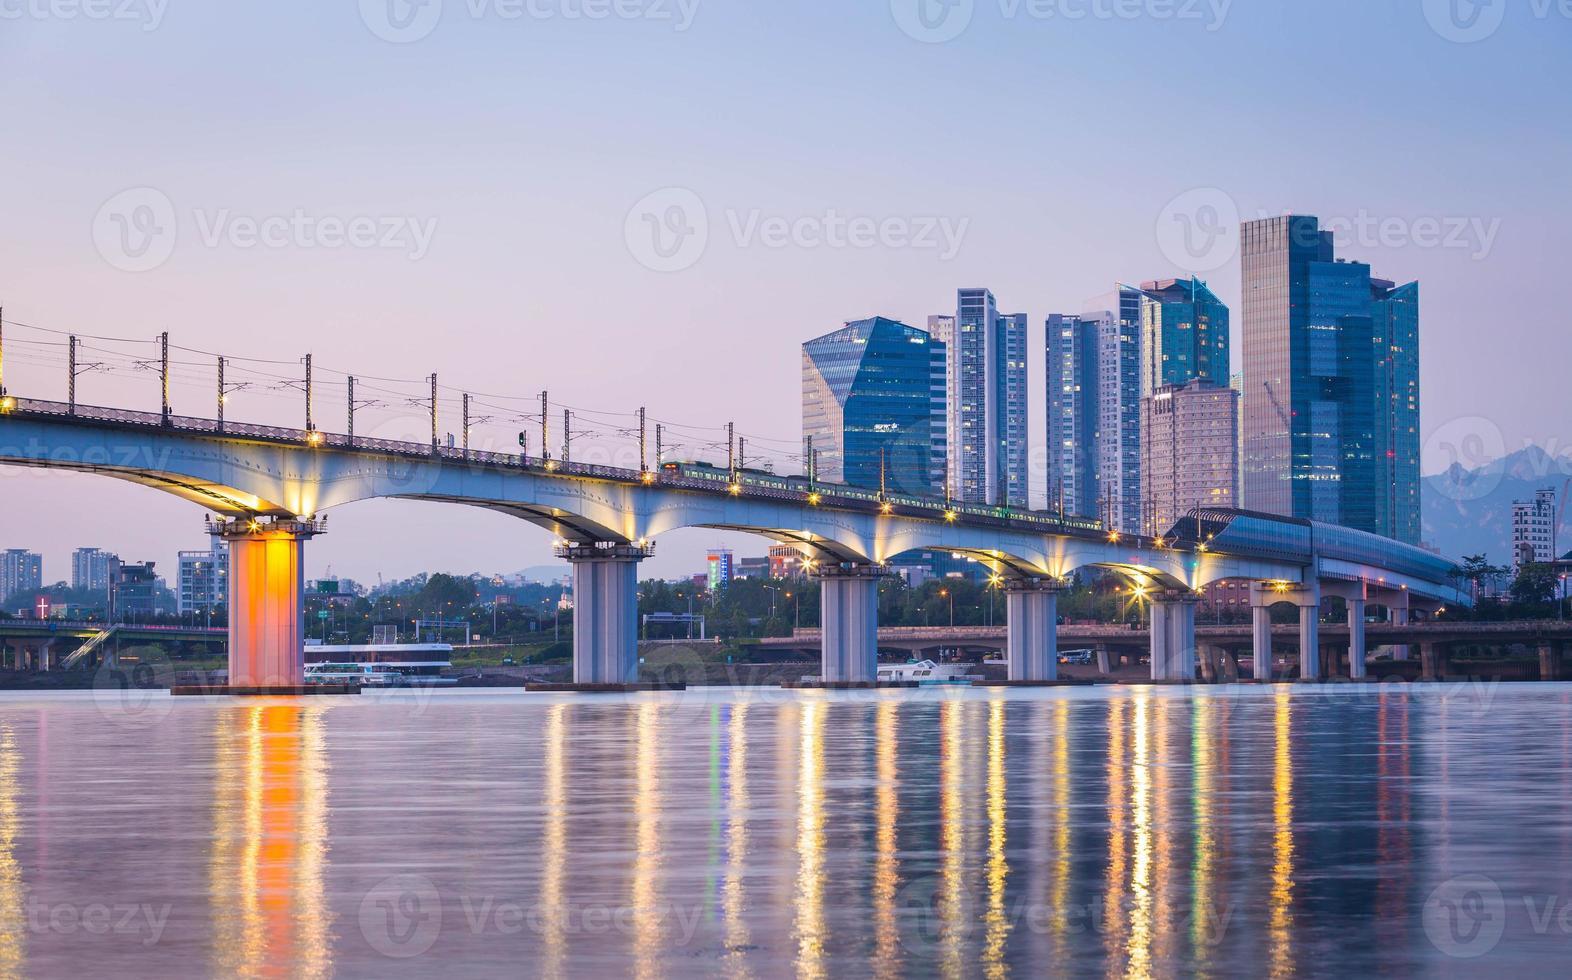 metropolitana e ponte a hanriver a seoul, corea del sud foto